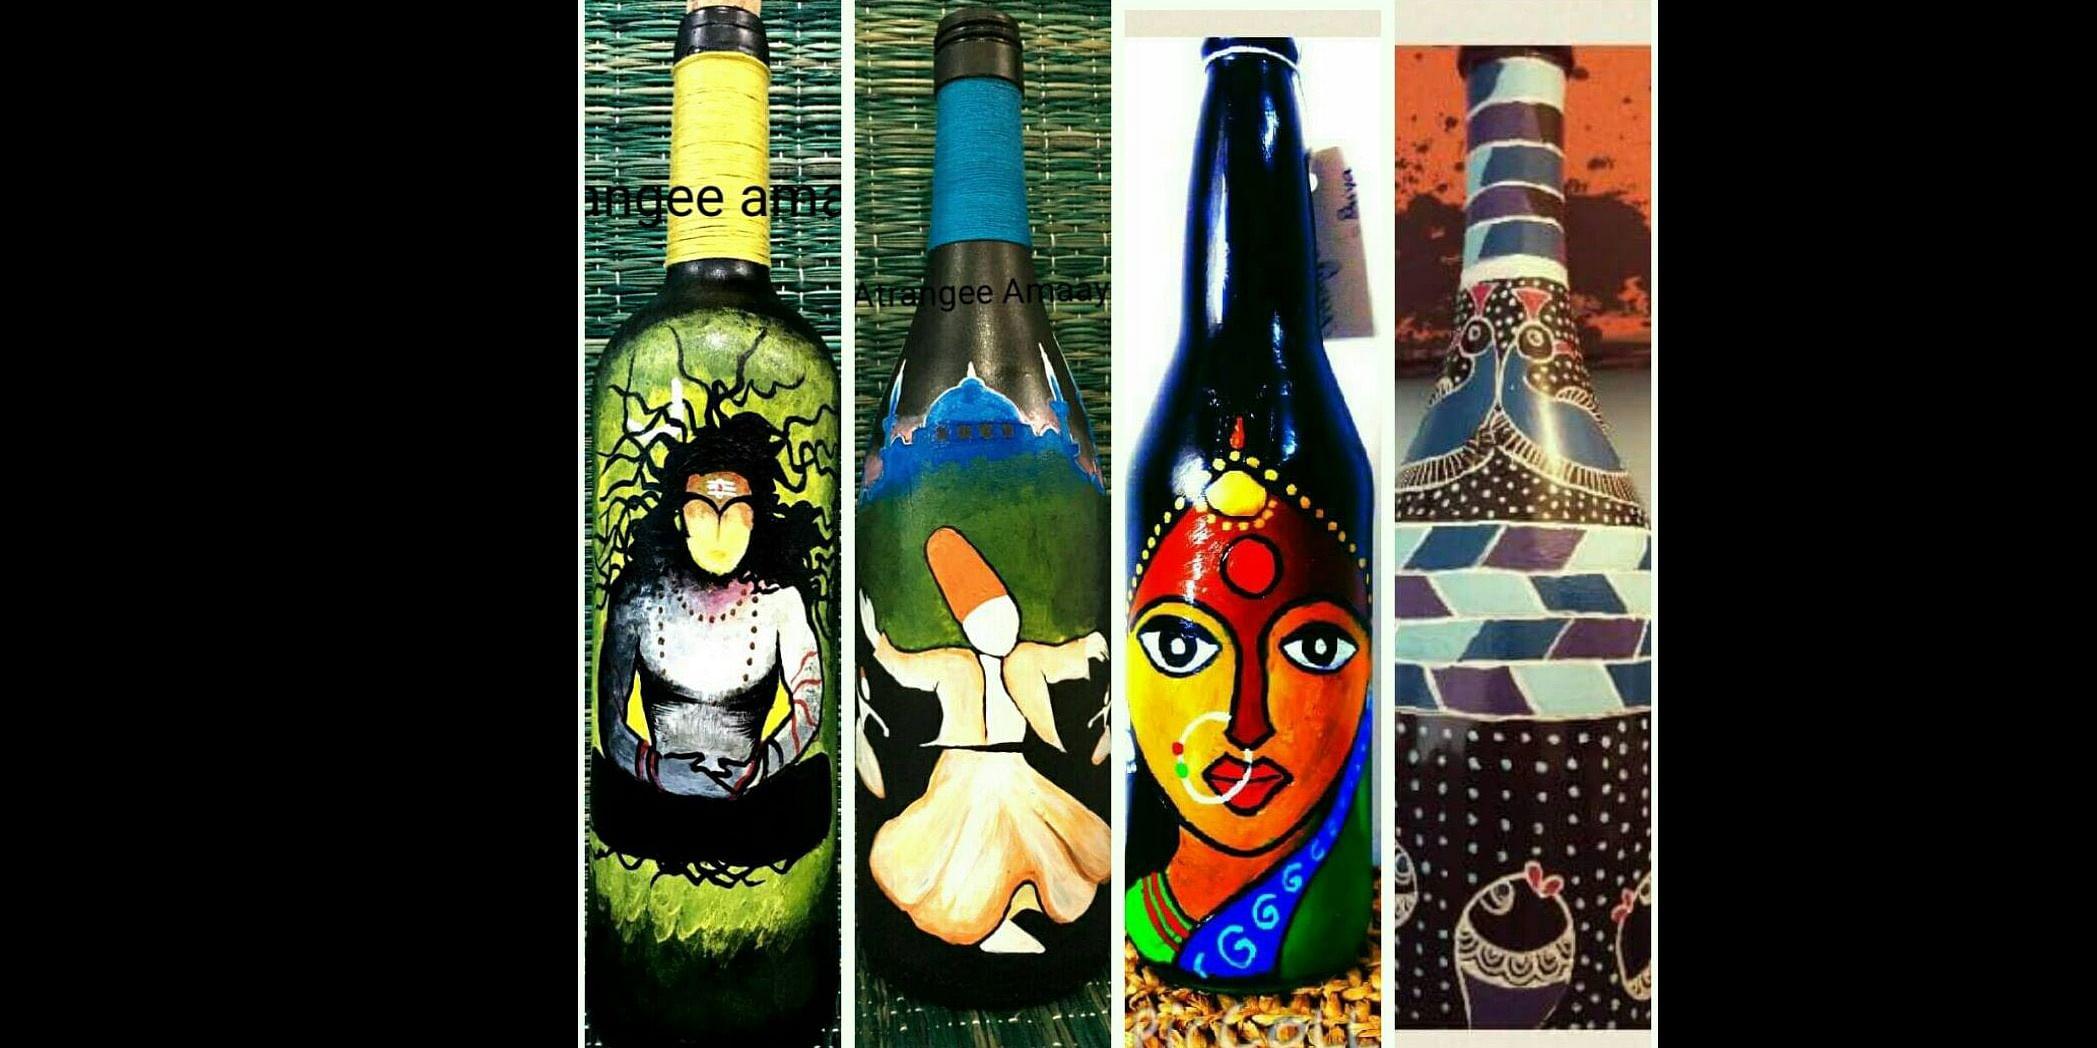 Art on wine bottles.